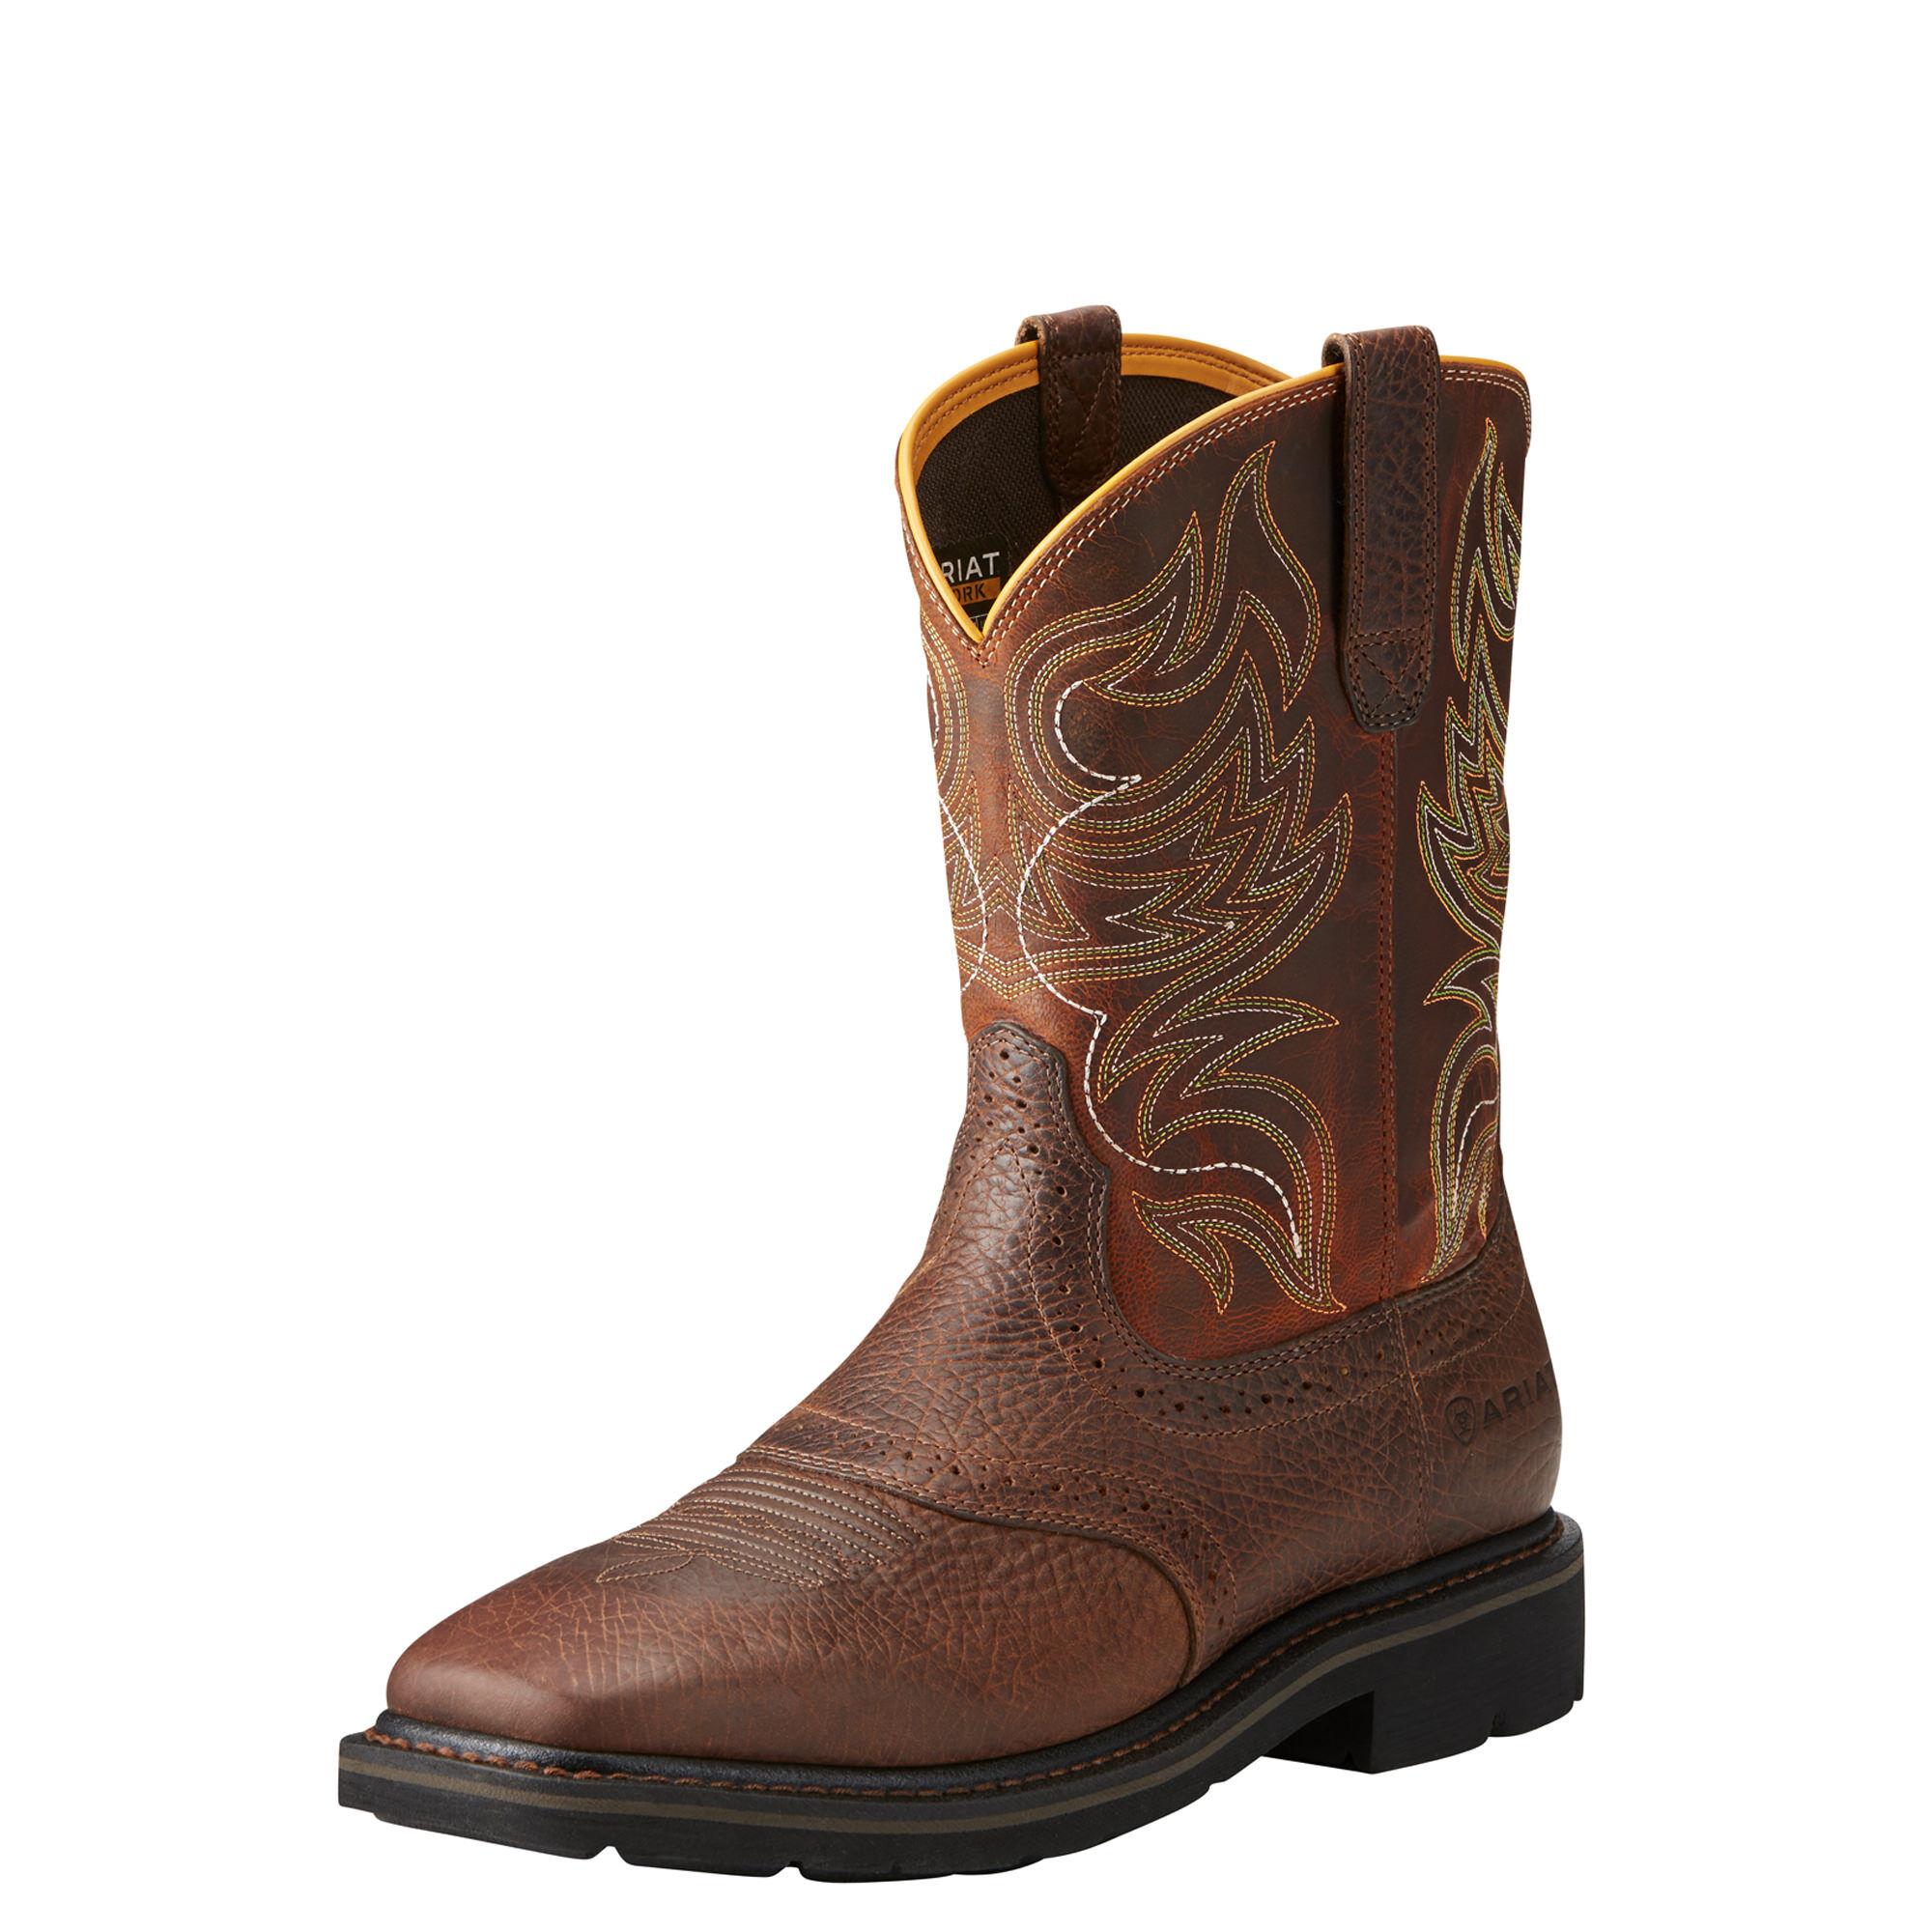 Sierra Shadowland Work Boot